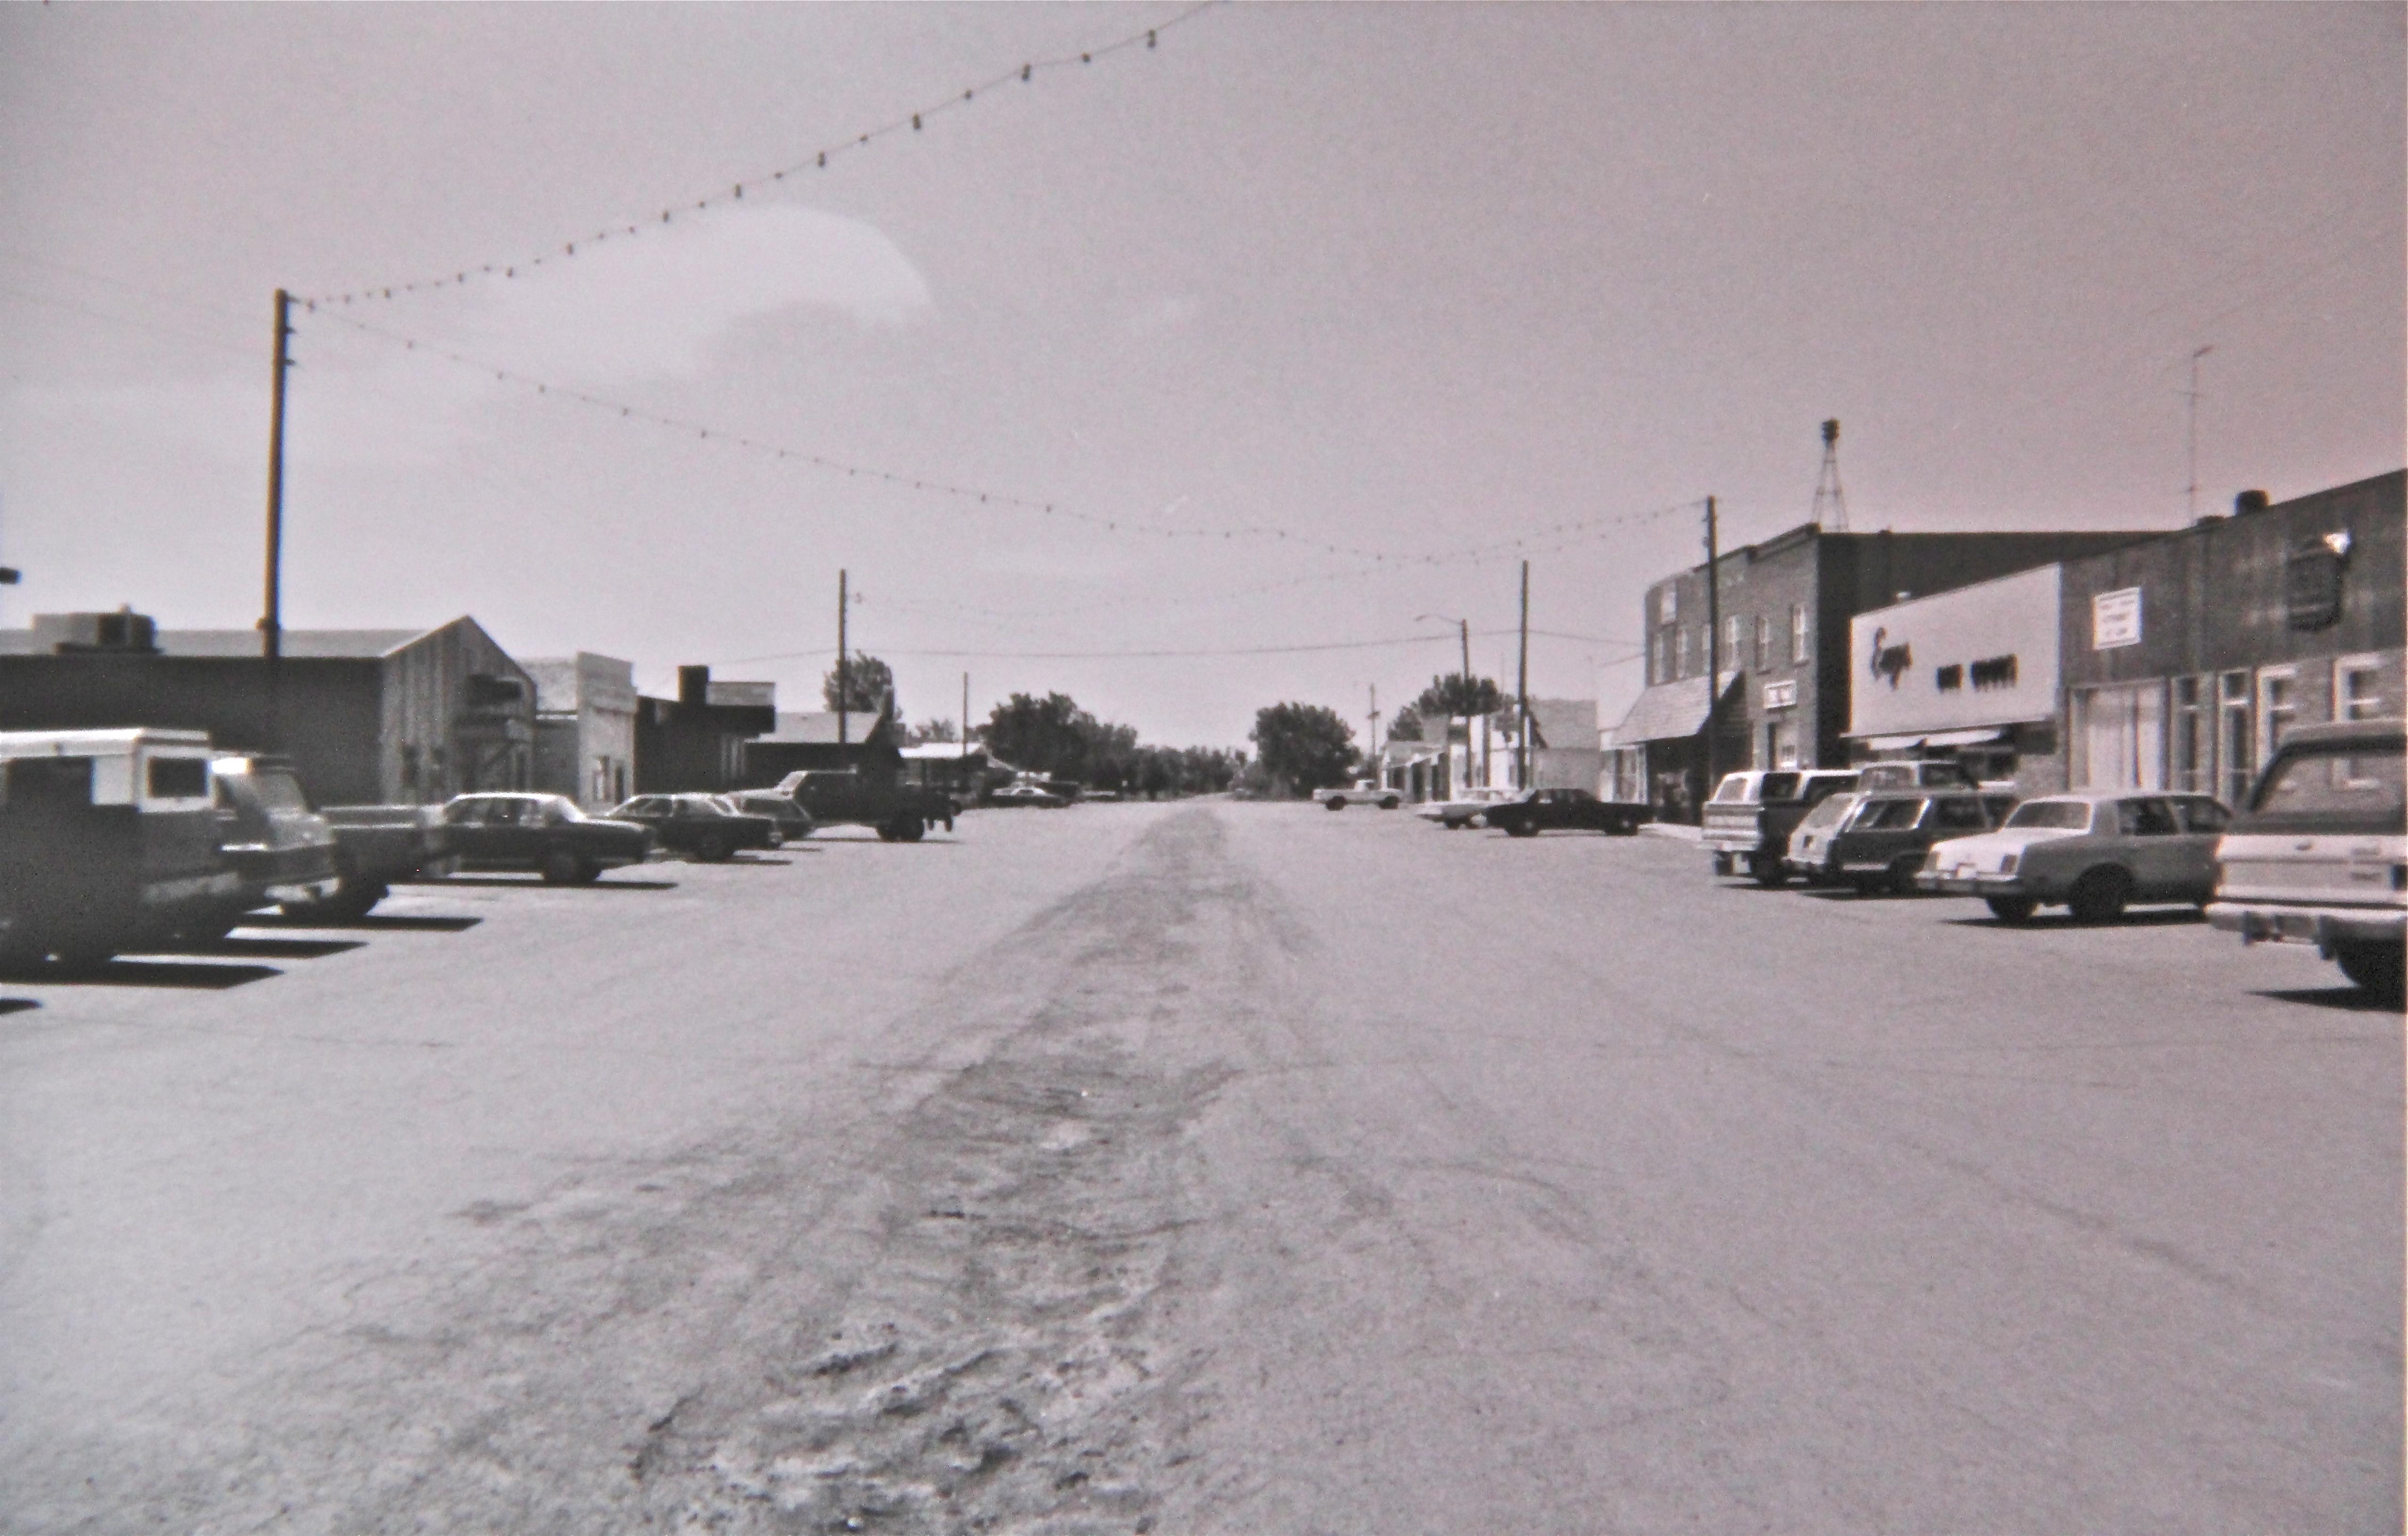 Montana rosebud county forsyth - Jordan Mid 1980s